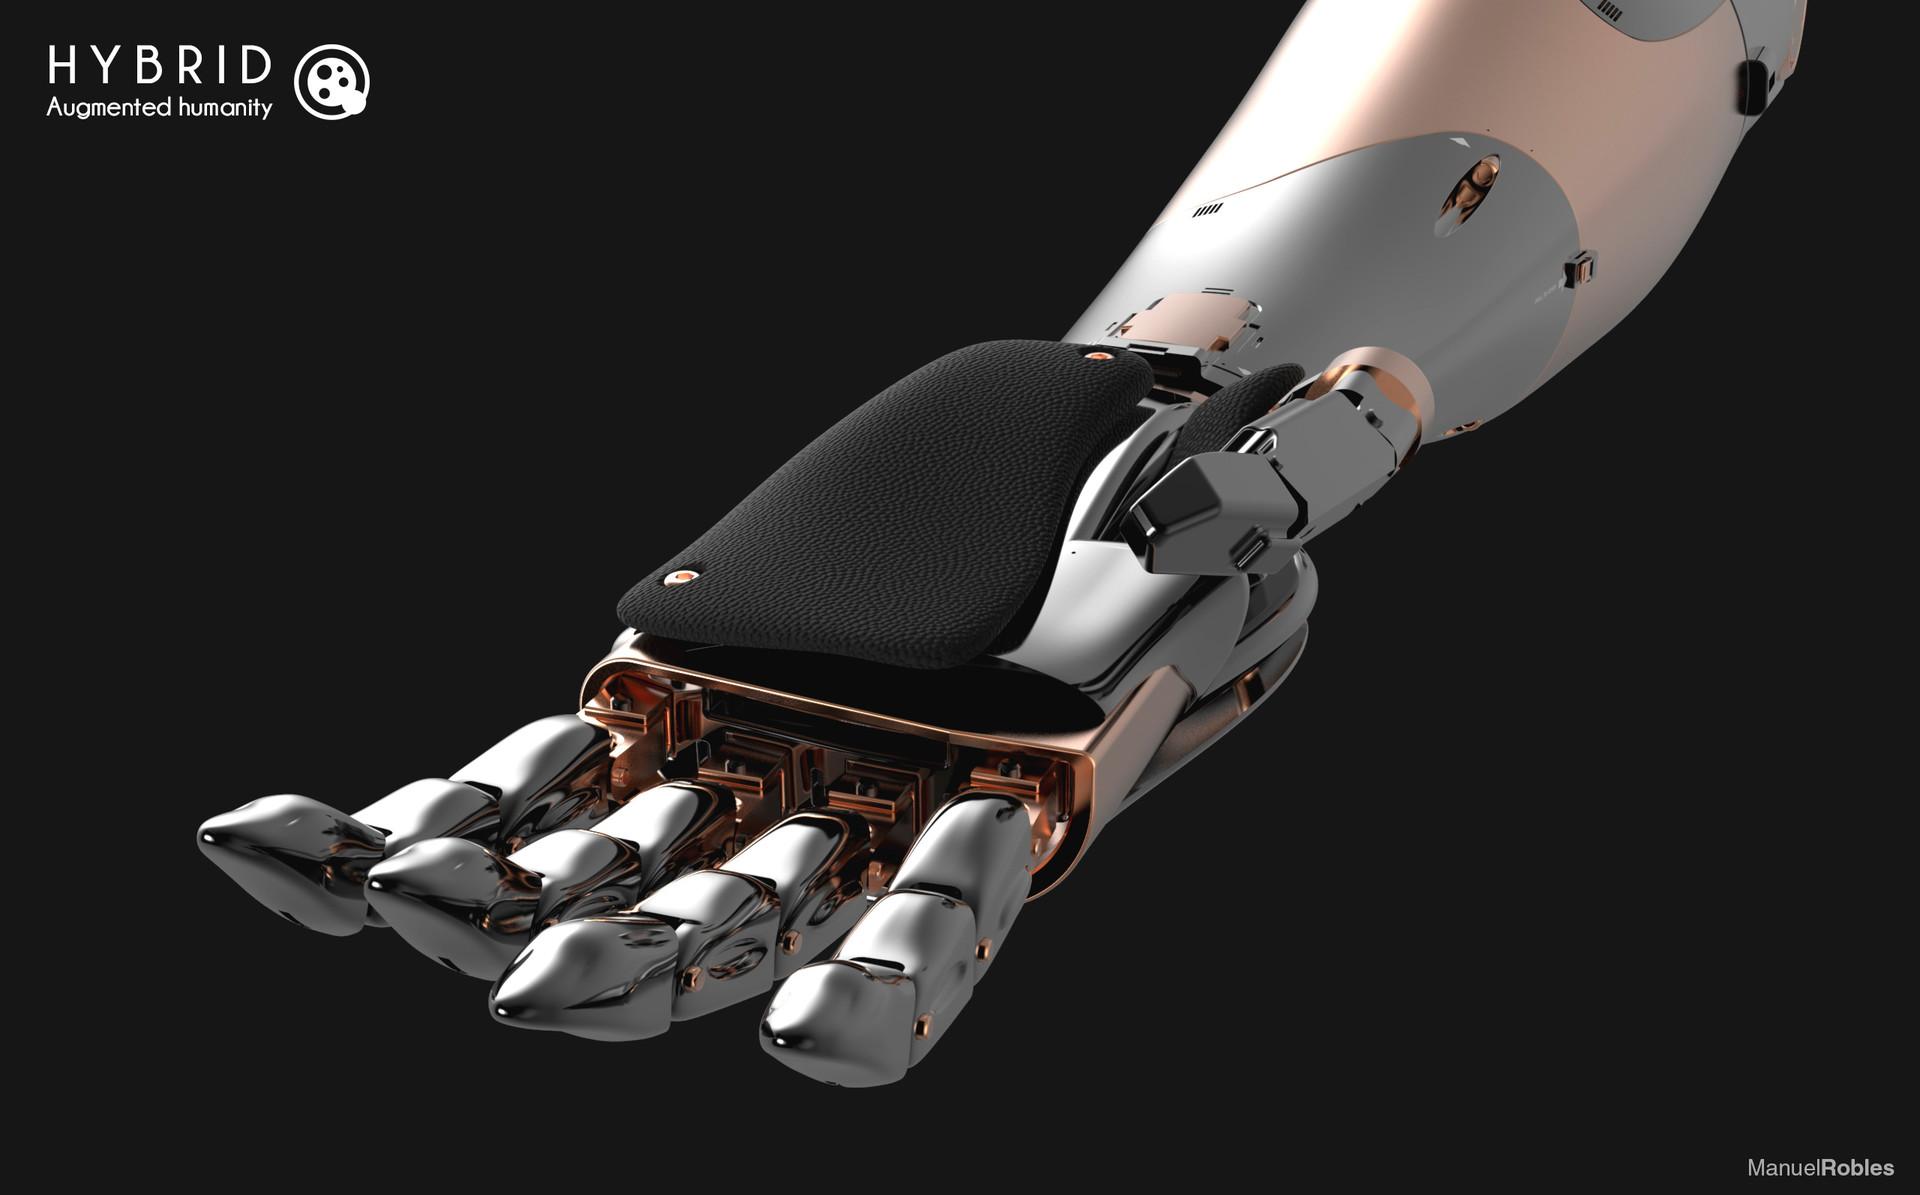 Manuel robles robot arm keyshot 10